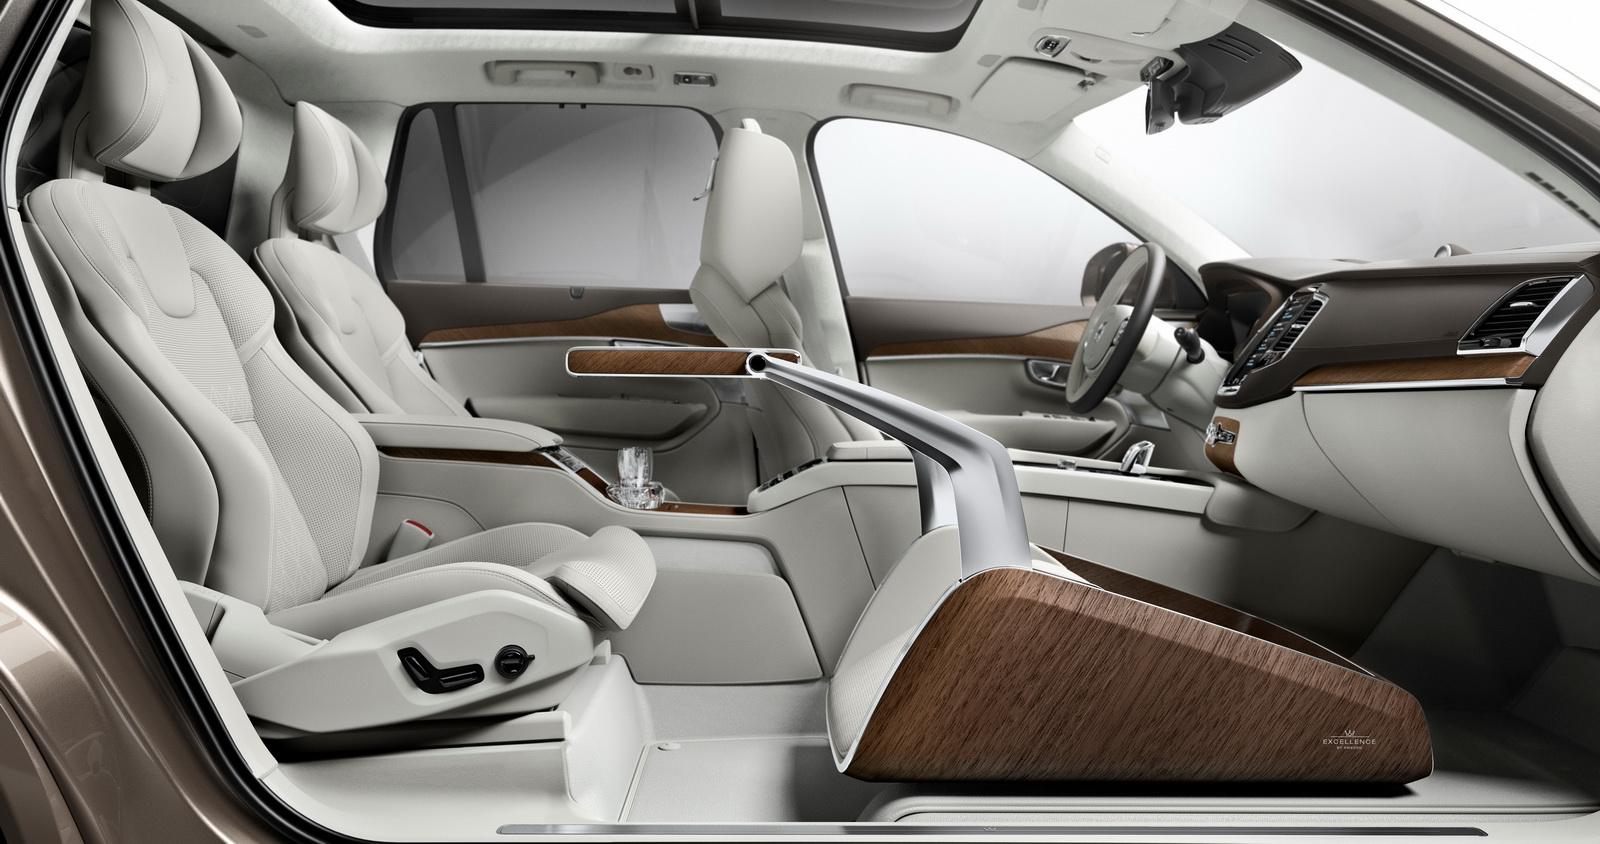 official volvo xc90 lounge console interior concept gtspirit. Black Bedroom Furniture Sets. Home Design Ideas